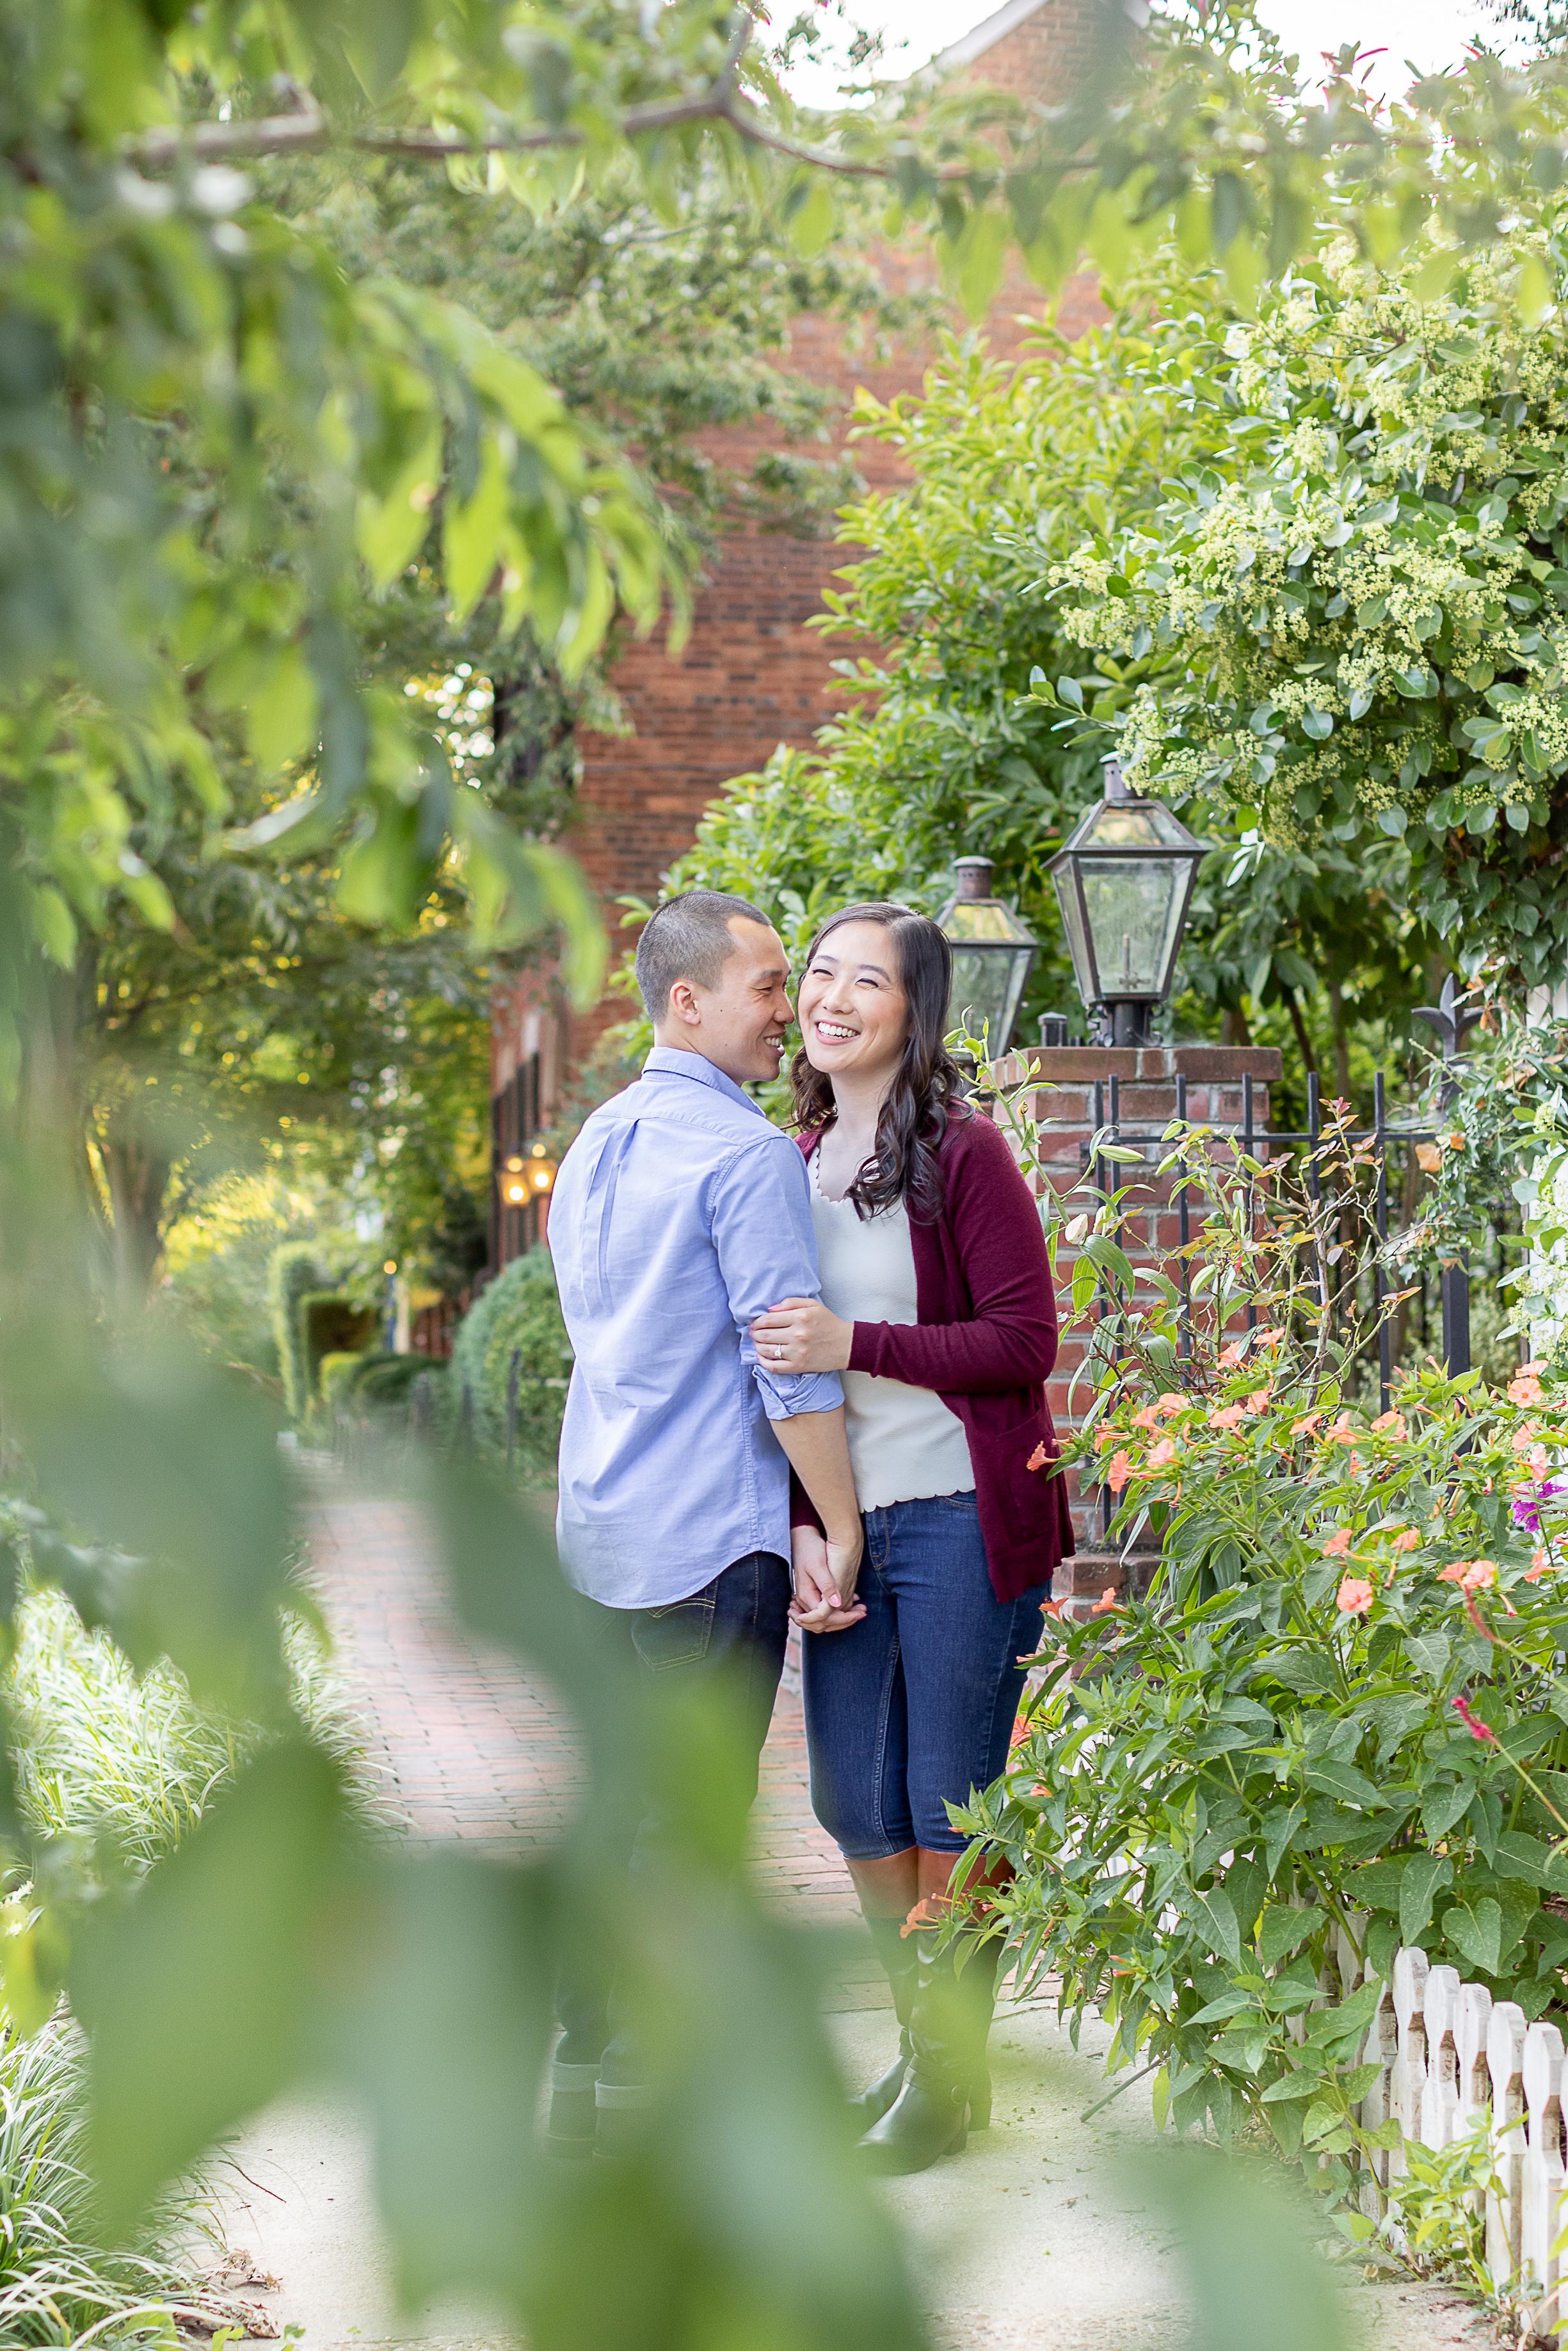 d2 Tammy-Louis-Engagement-Kim-Pham-Clark-Photography-54.jpg